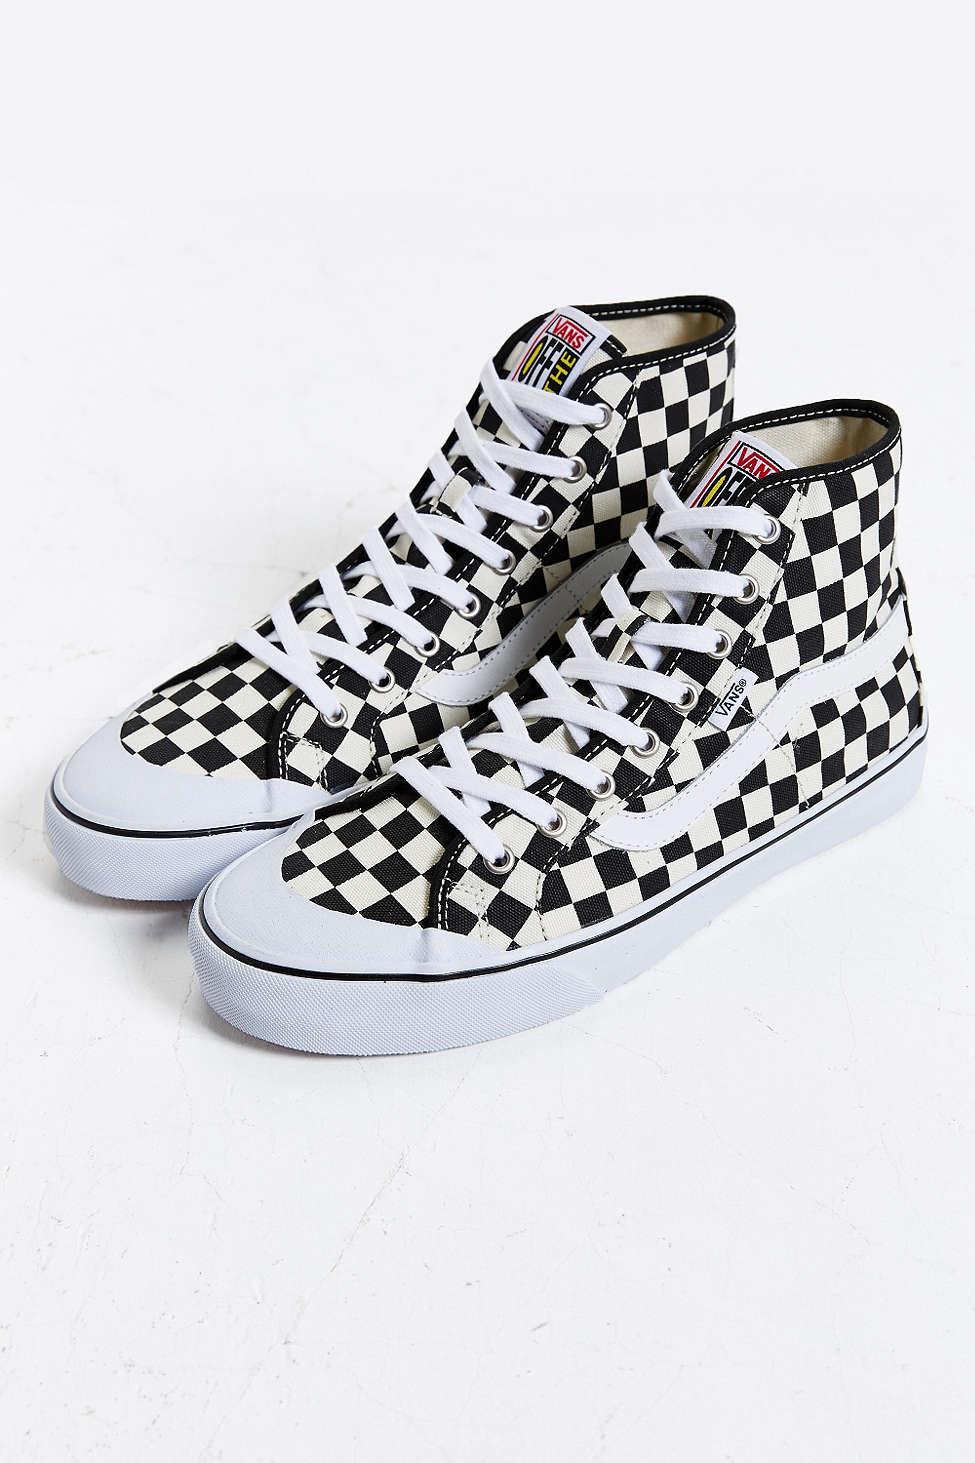 a473bf0868 vans checkerboard high tops